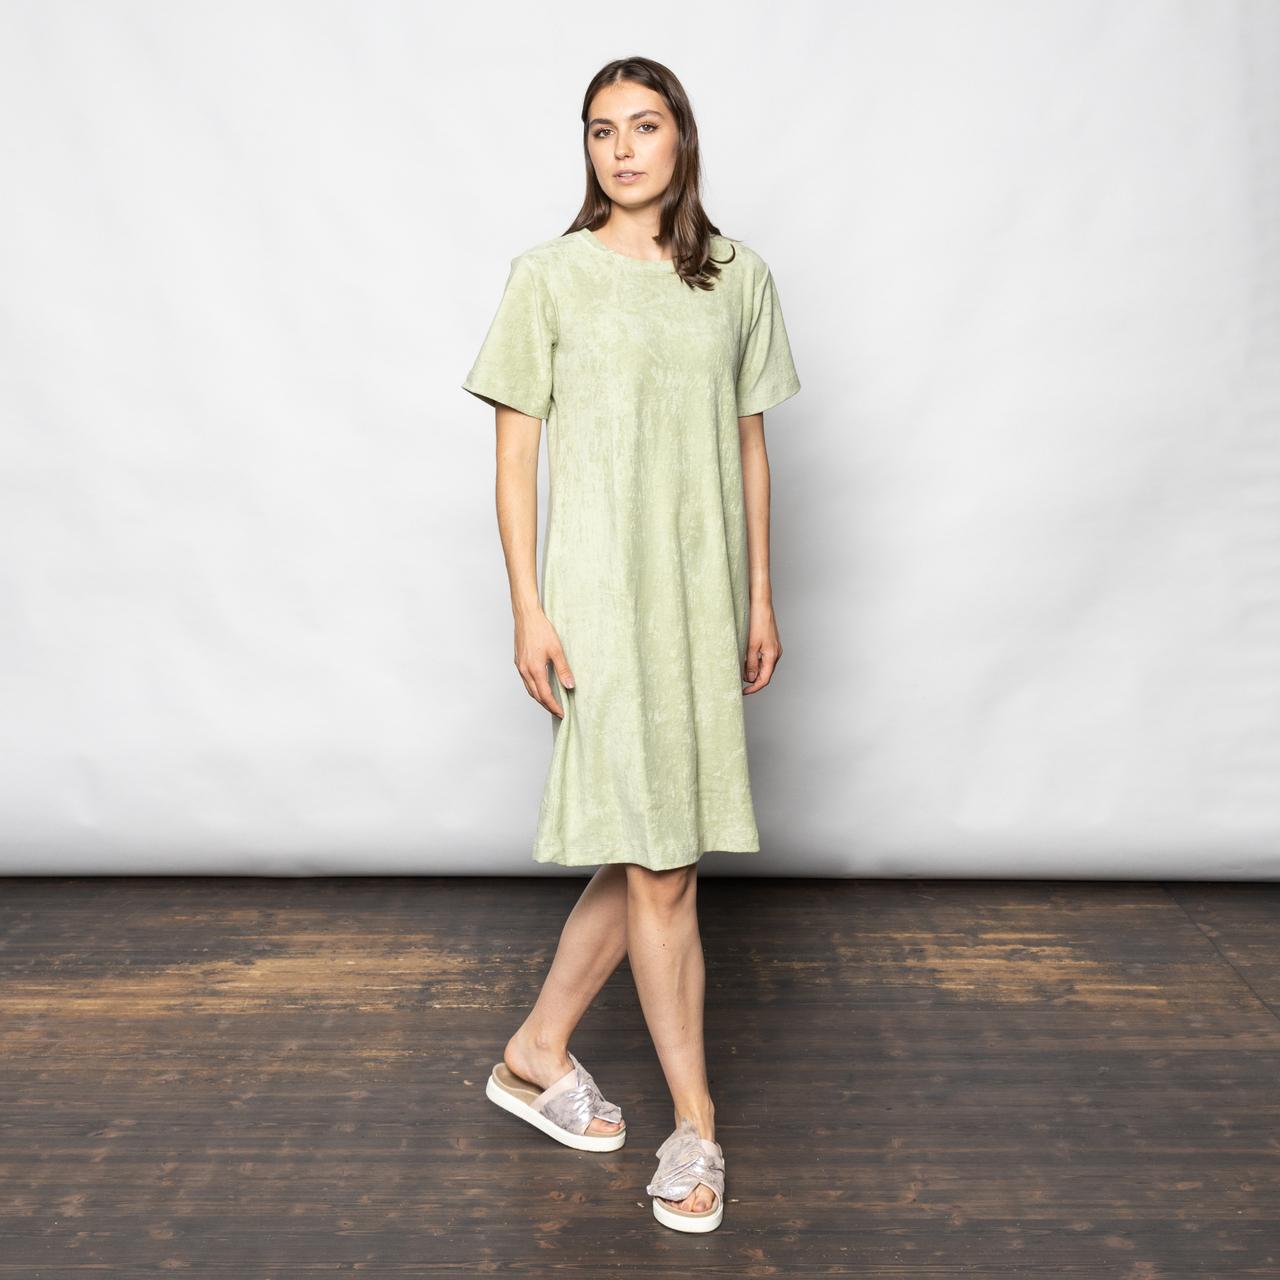 Grünes Frottee-Kleid von 'Anja Sun Suko'